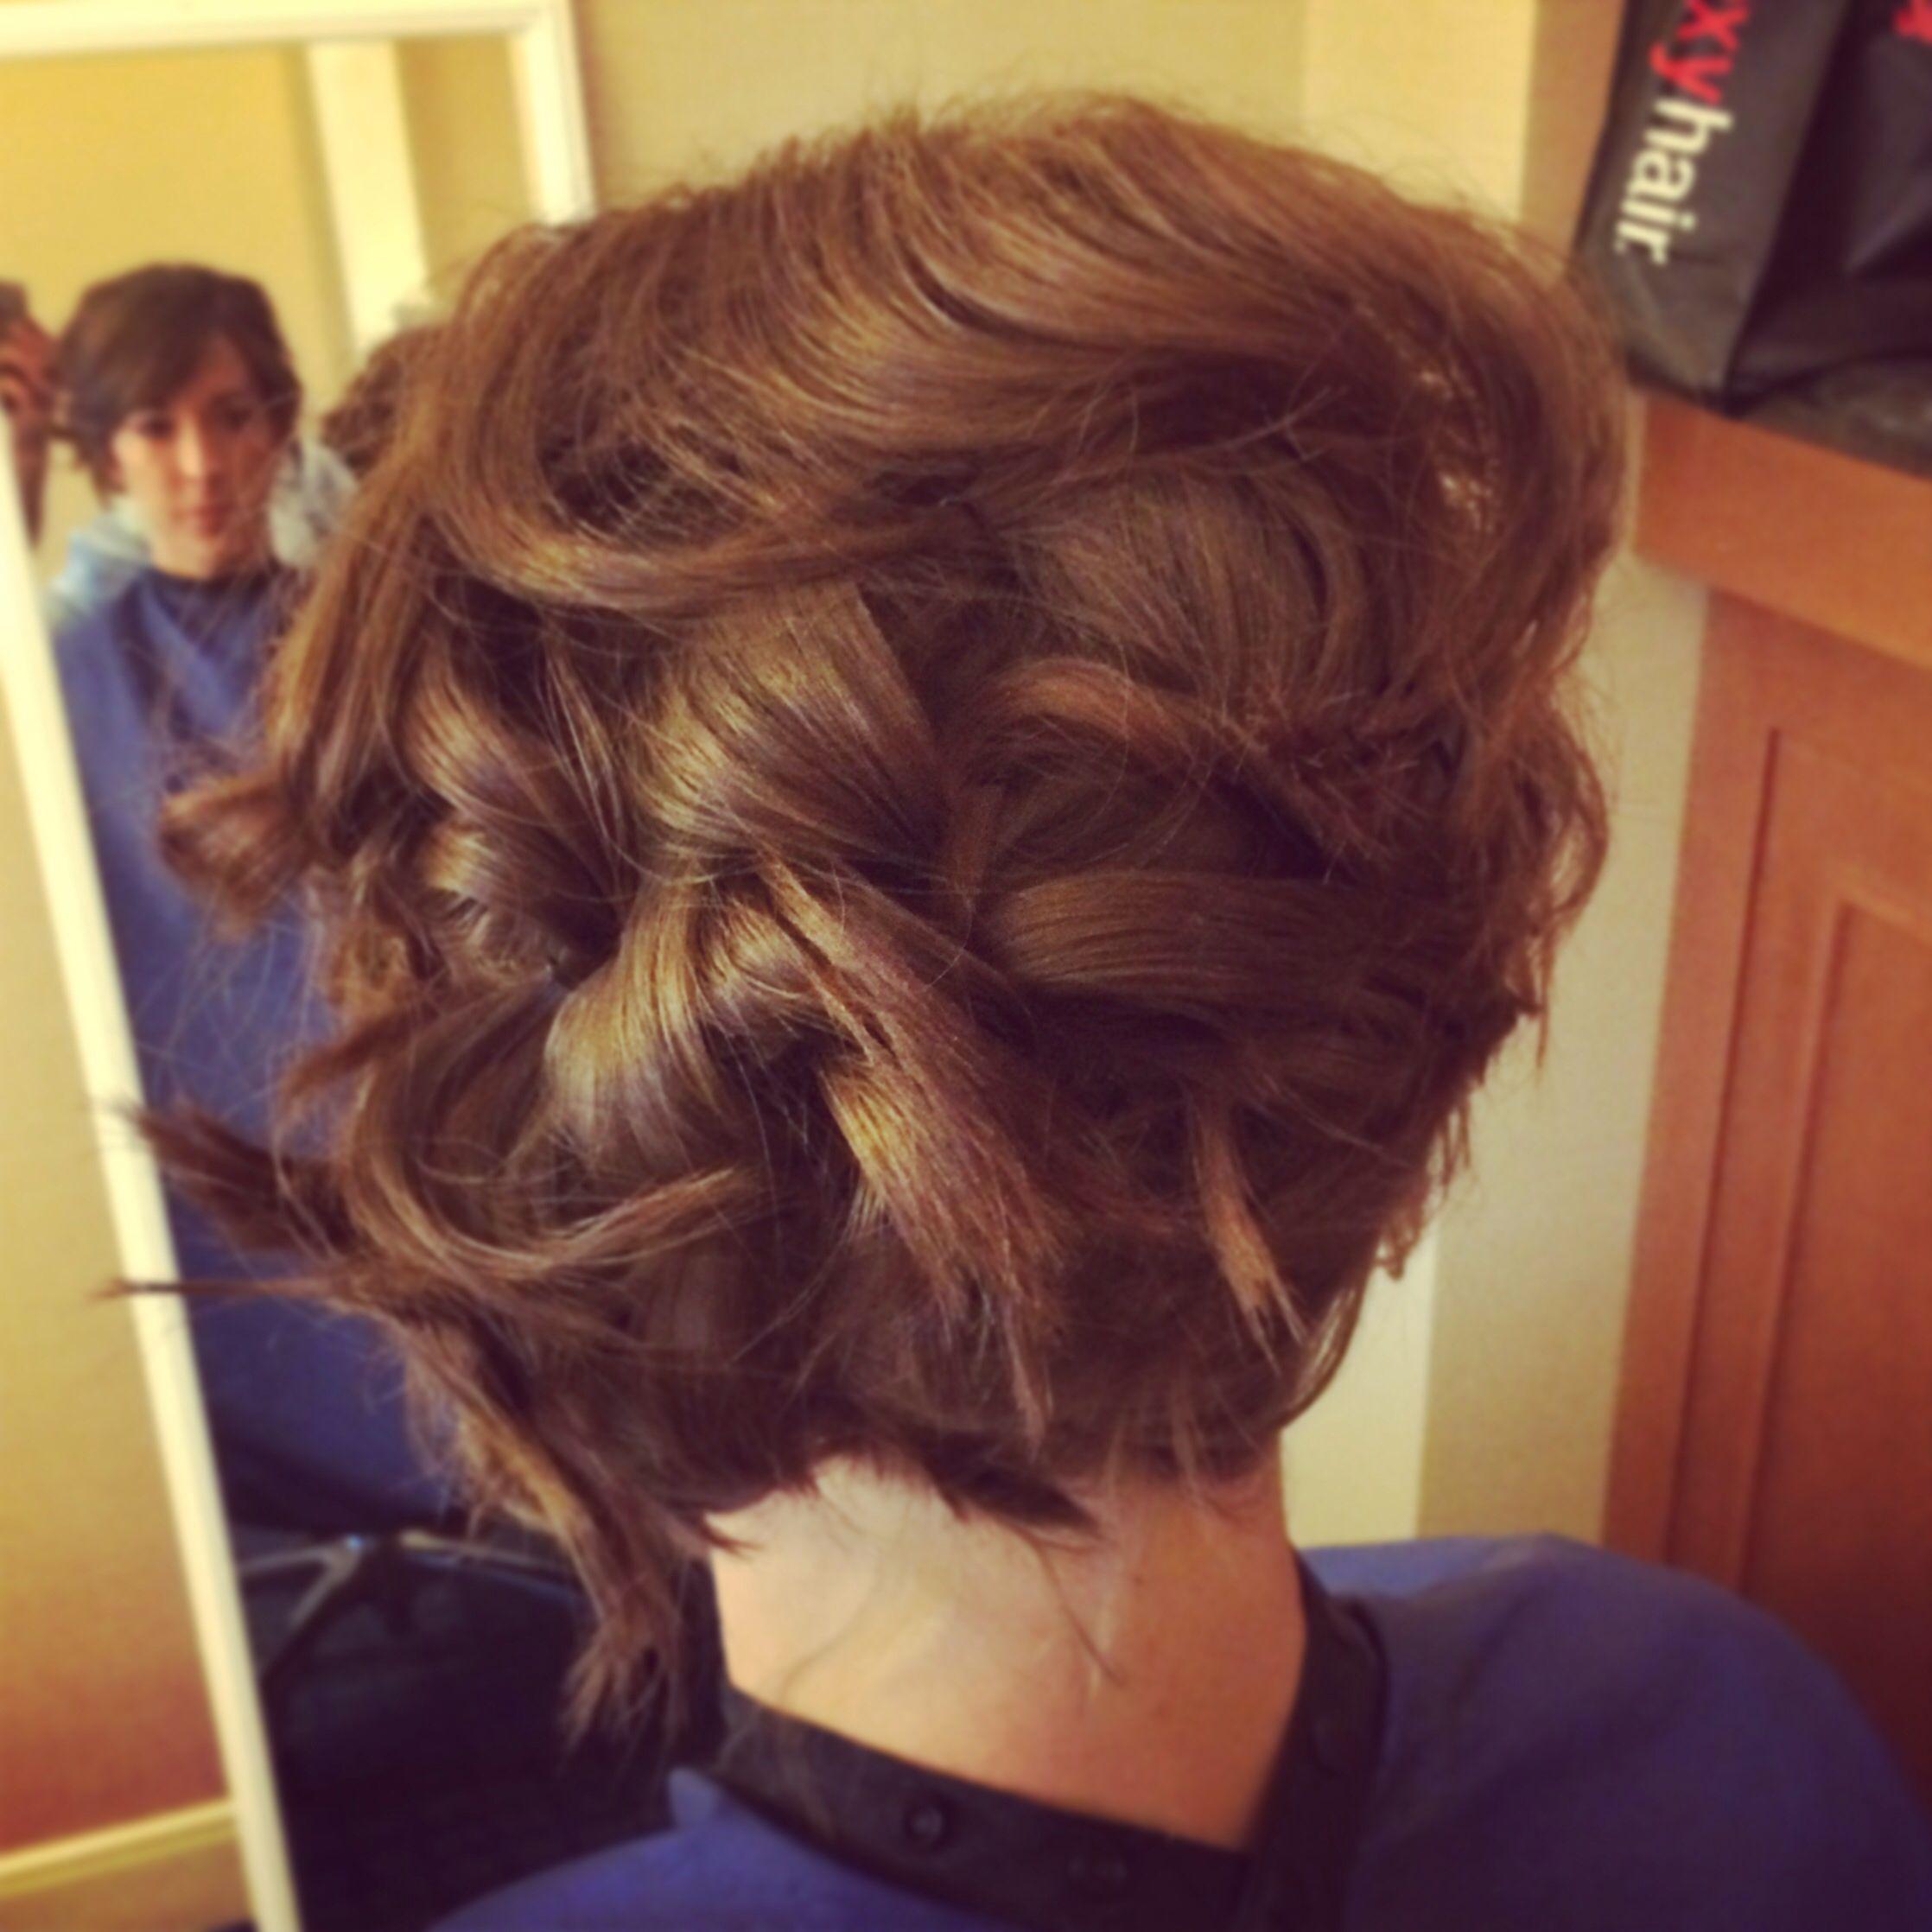 Surprising Hair Updo For Short Hair By Natalie Land Salon 116 Download Free Architecture Designs Scobabritishbridgeorg